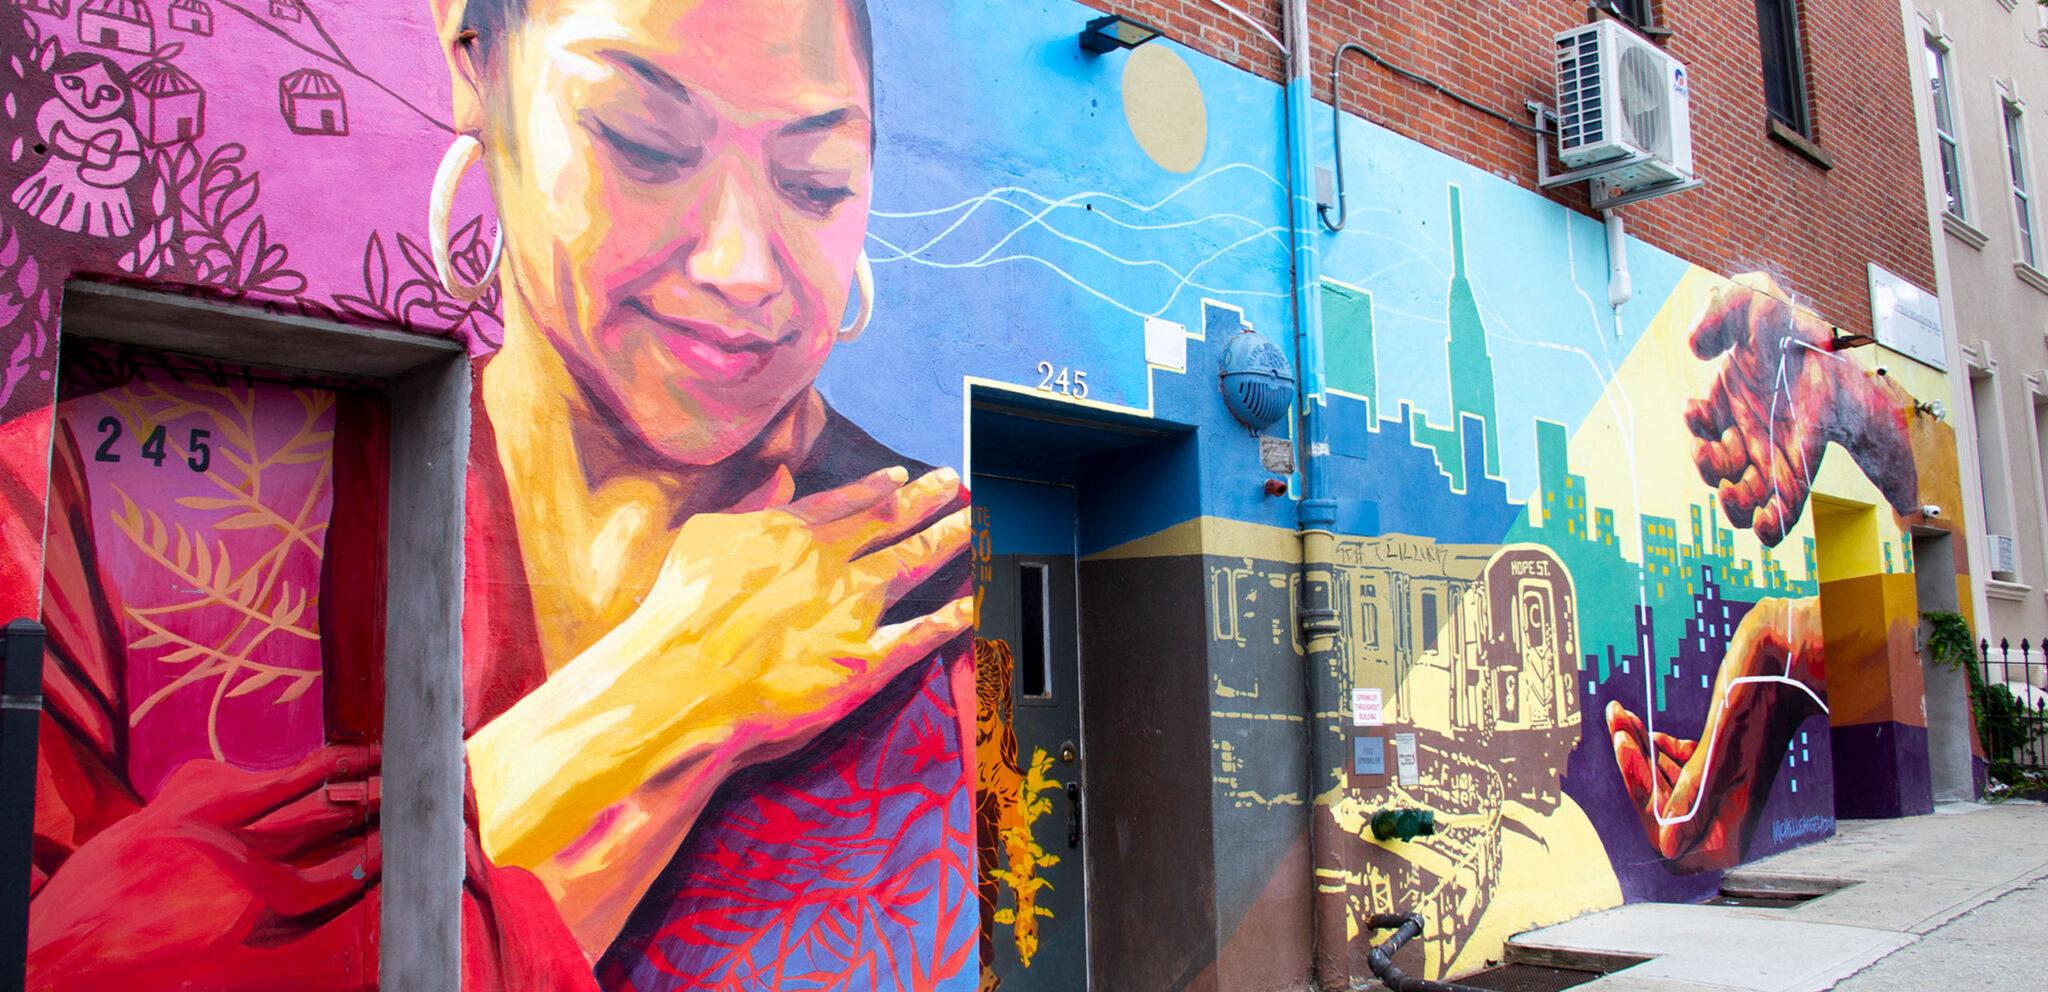 305 Twenty Third Brooklyn - Neighborhood Photography - Mural